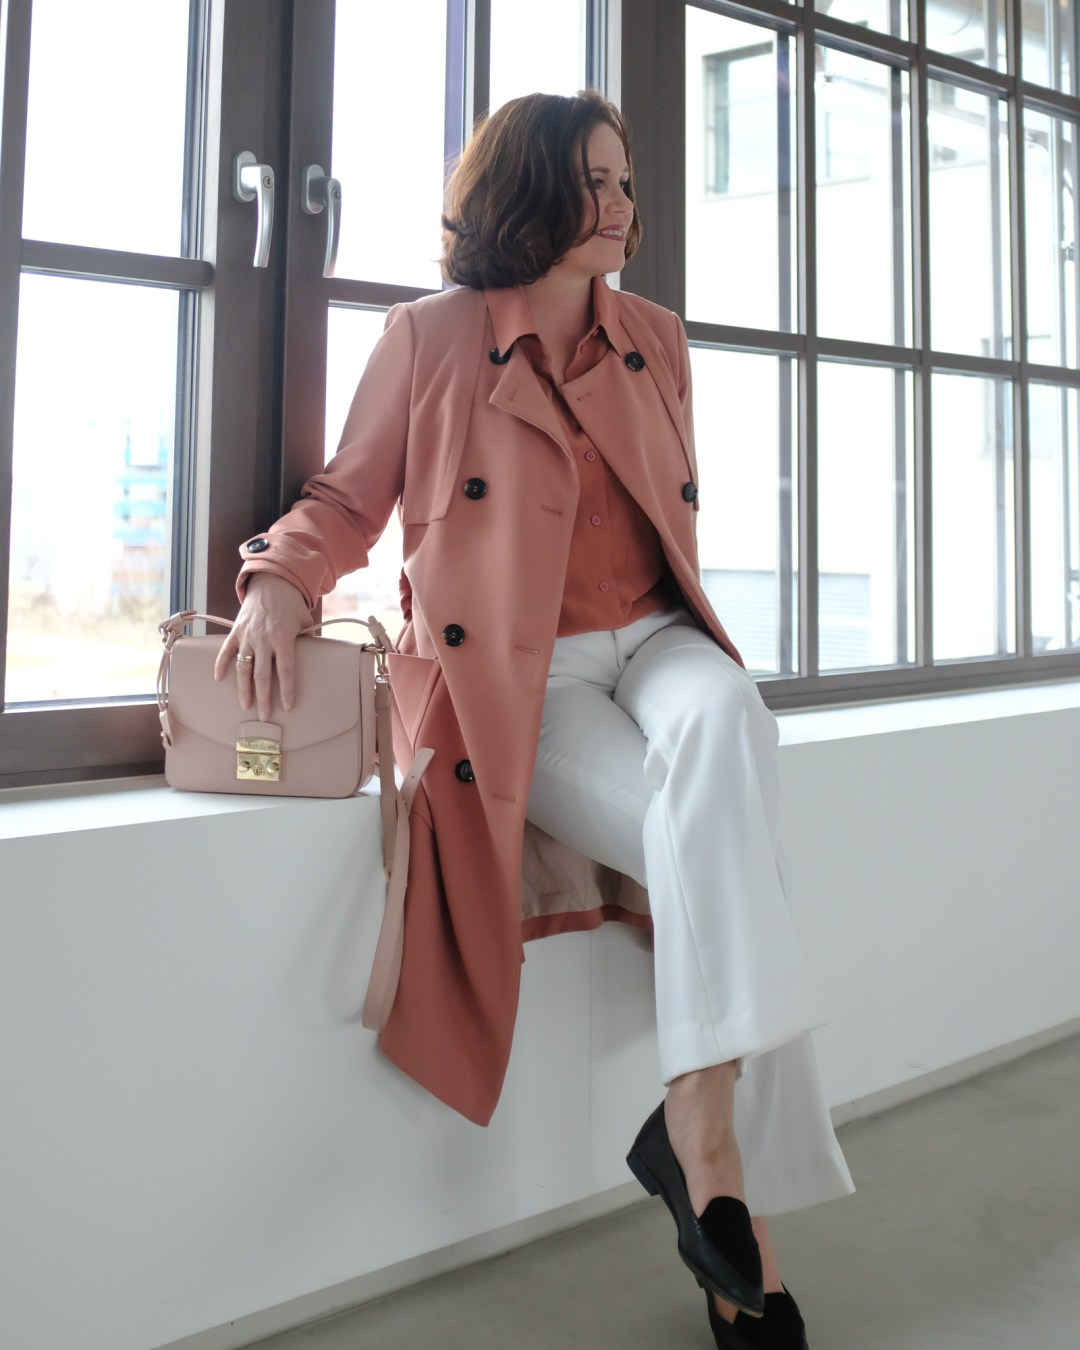 inastil, Trenchcoat, Springcoat, Frühjahrsmode, Stilberatung, Ü50Mode, Modeberatung, Frühlingsfarben, Modeblogger-11